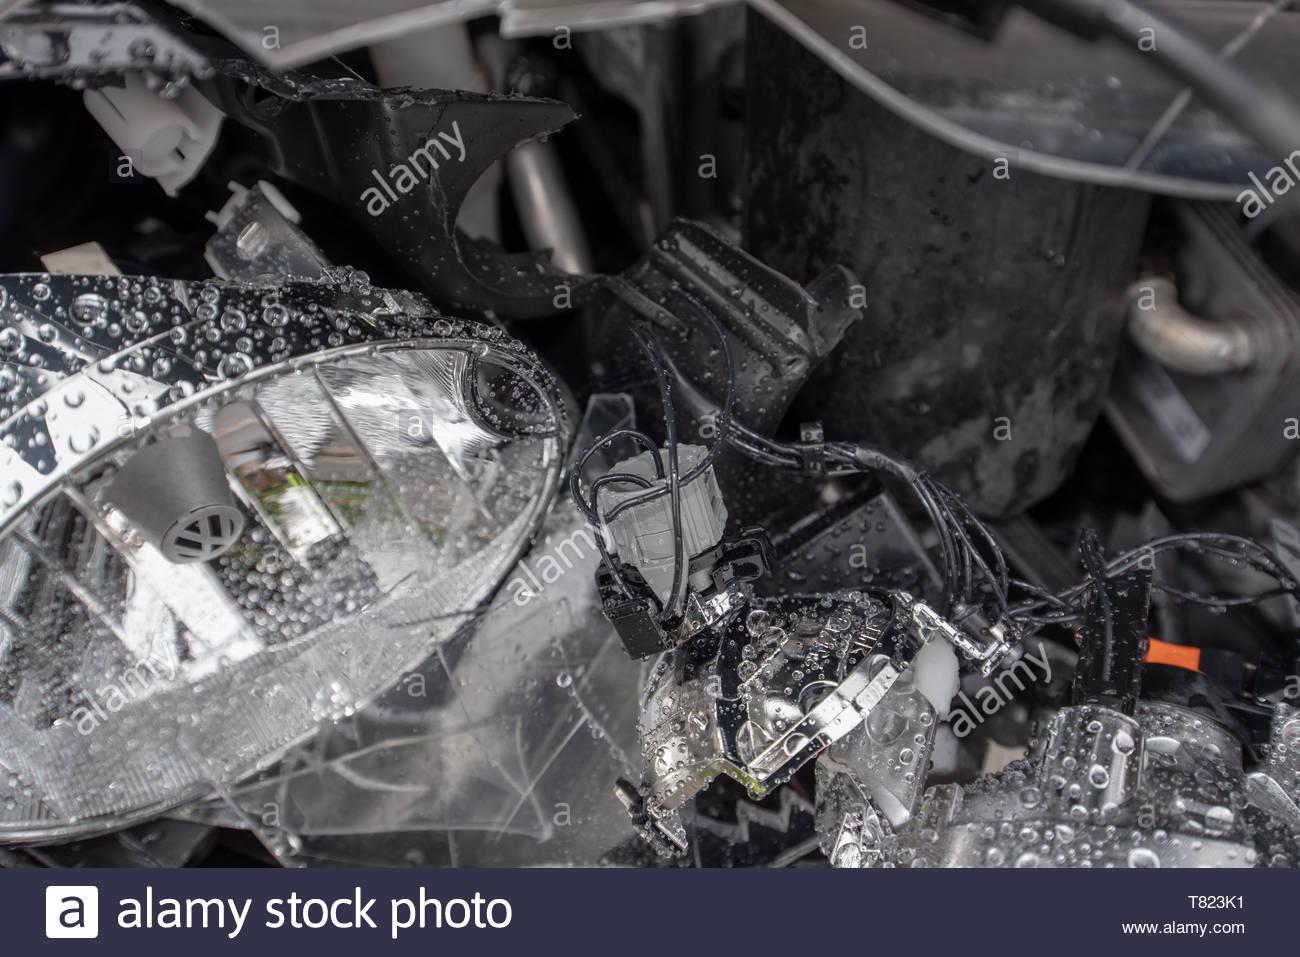 Head on car crash with police tape VW Golf blue Car crash 1300x957